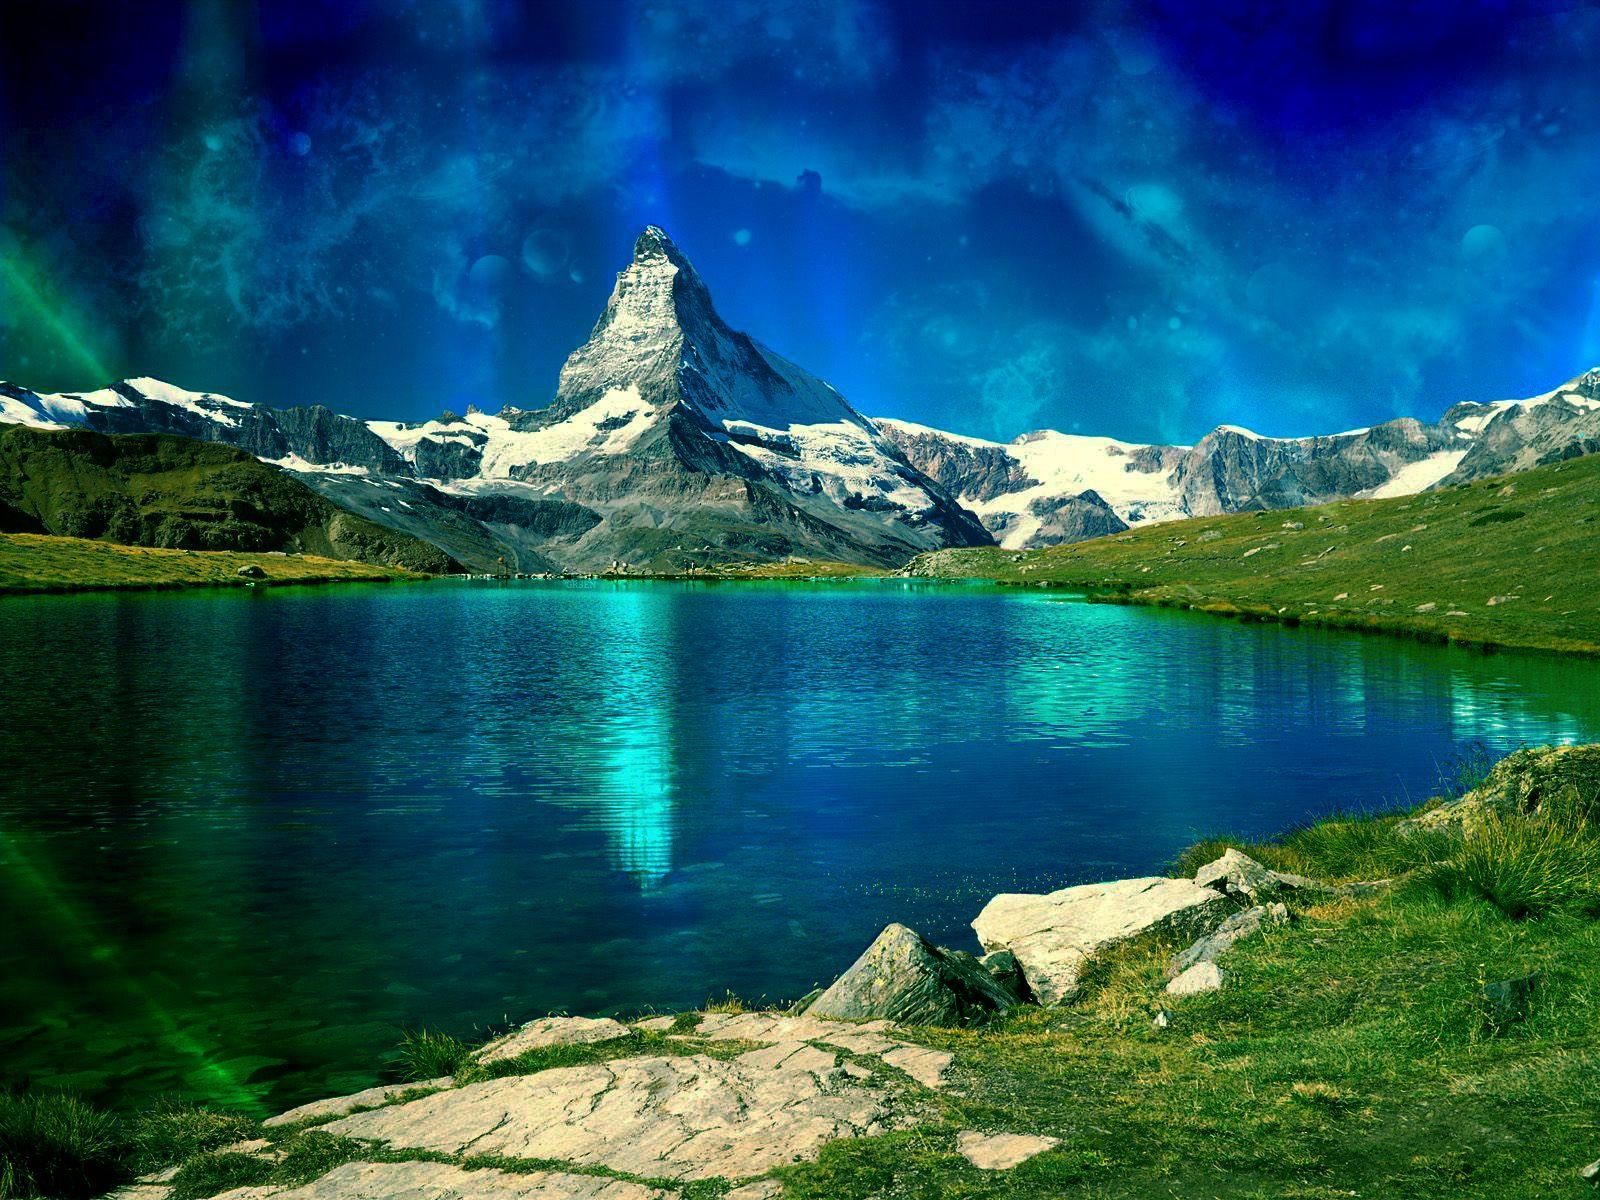 Download Wallpaper Mountain Windows Vista - 2c141d428f2d25bbda50c1021671e42d  Image_676867.jpg